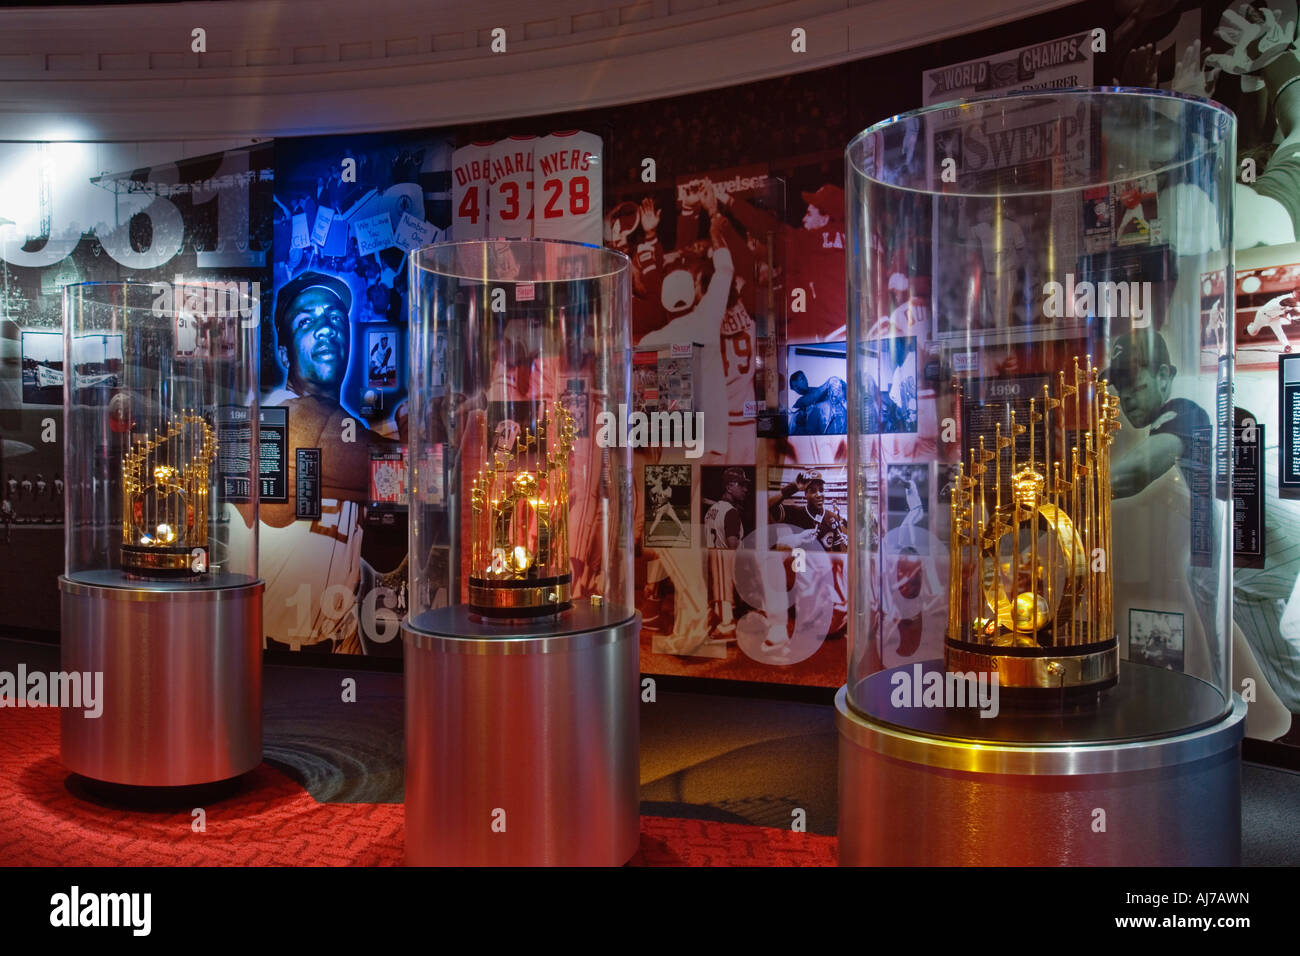 Three World Series Trophies on Exhibit at the Cincinnati Reds Hall of Fame, Cincinnati Ohio. - Stock Image